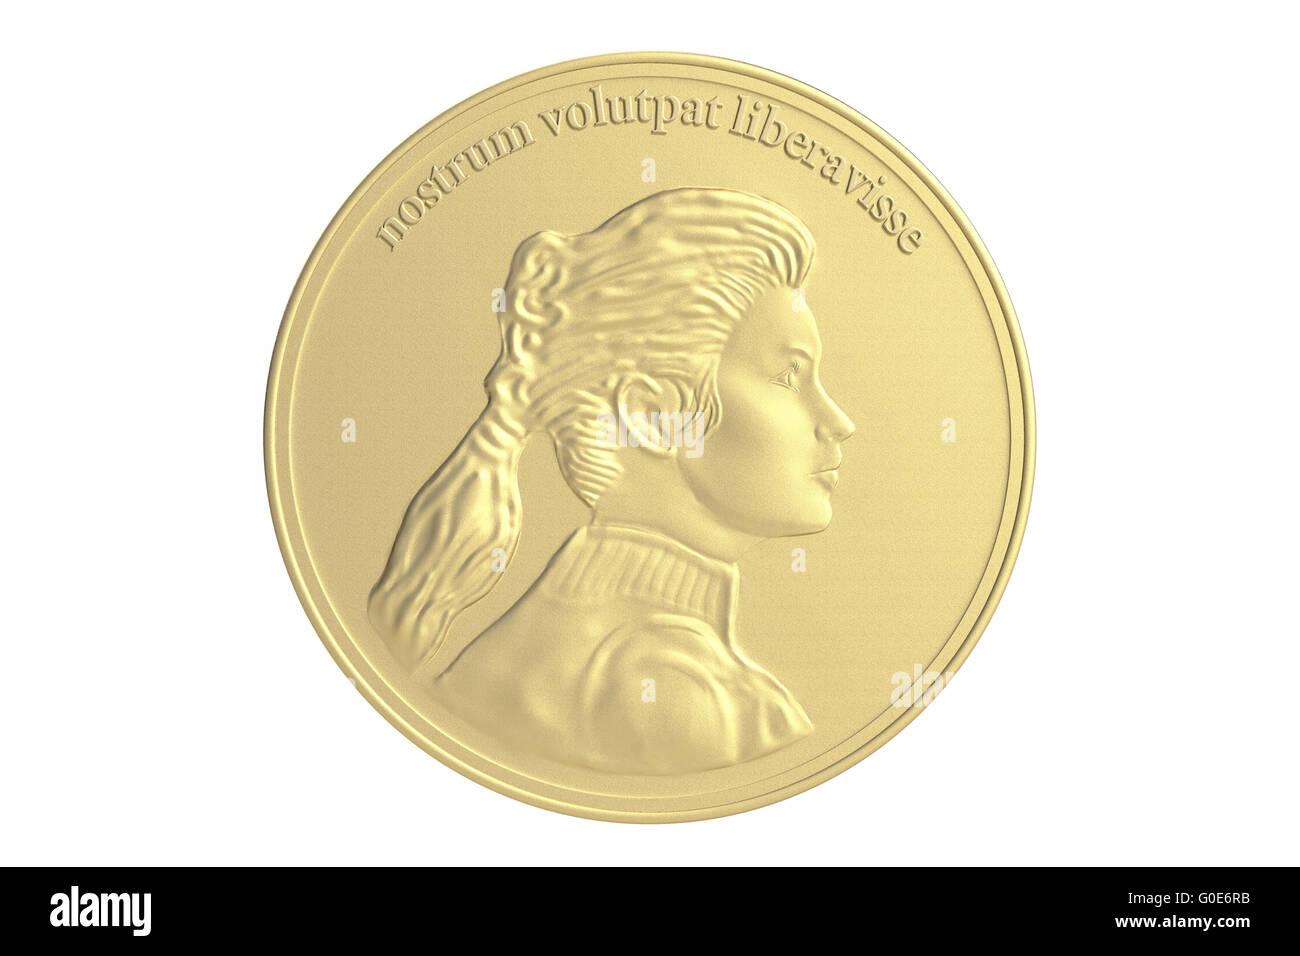 Gold Münze Medaille Stockfoto Bild 103574895 Alamy